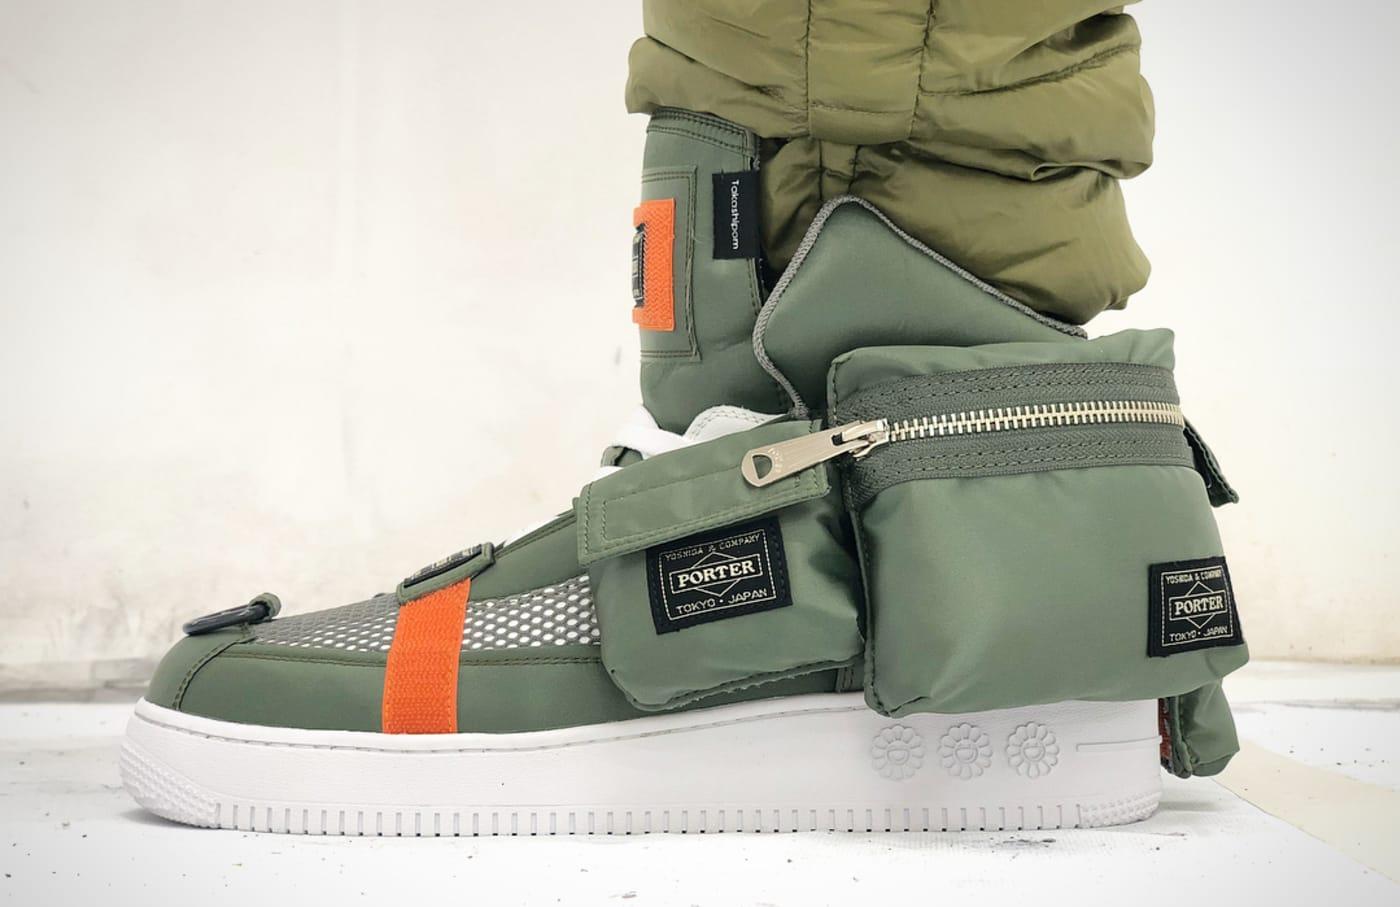 Porter x Takashi Murakami Sneaker (On Foot)